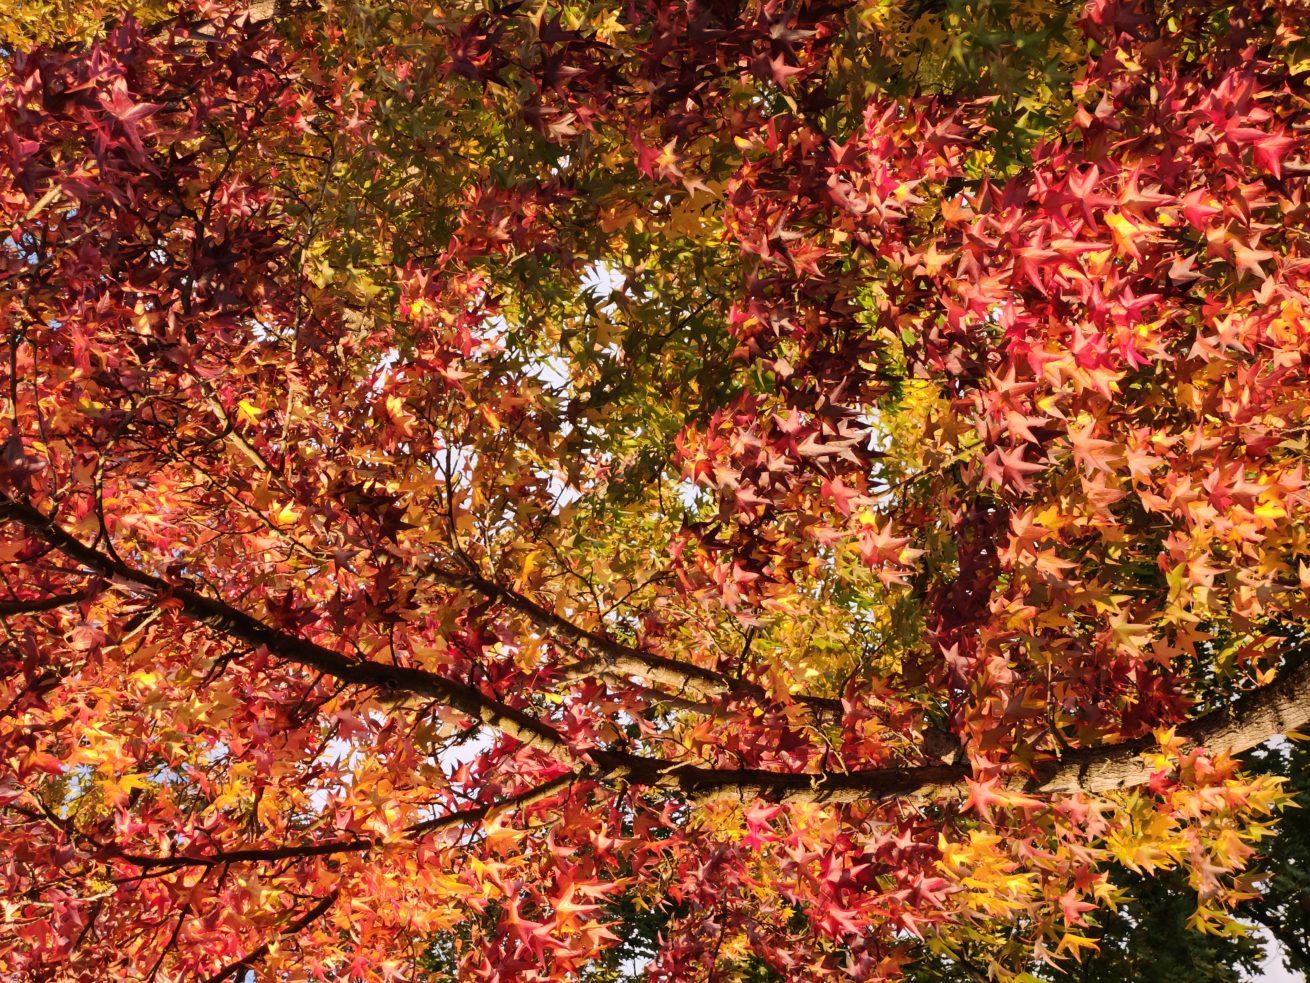 Amberbaum_Herbstlaub